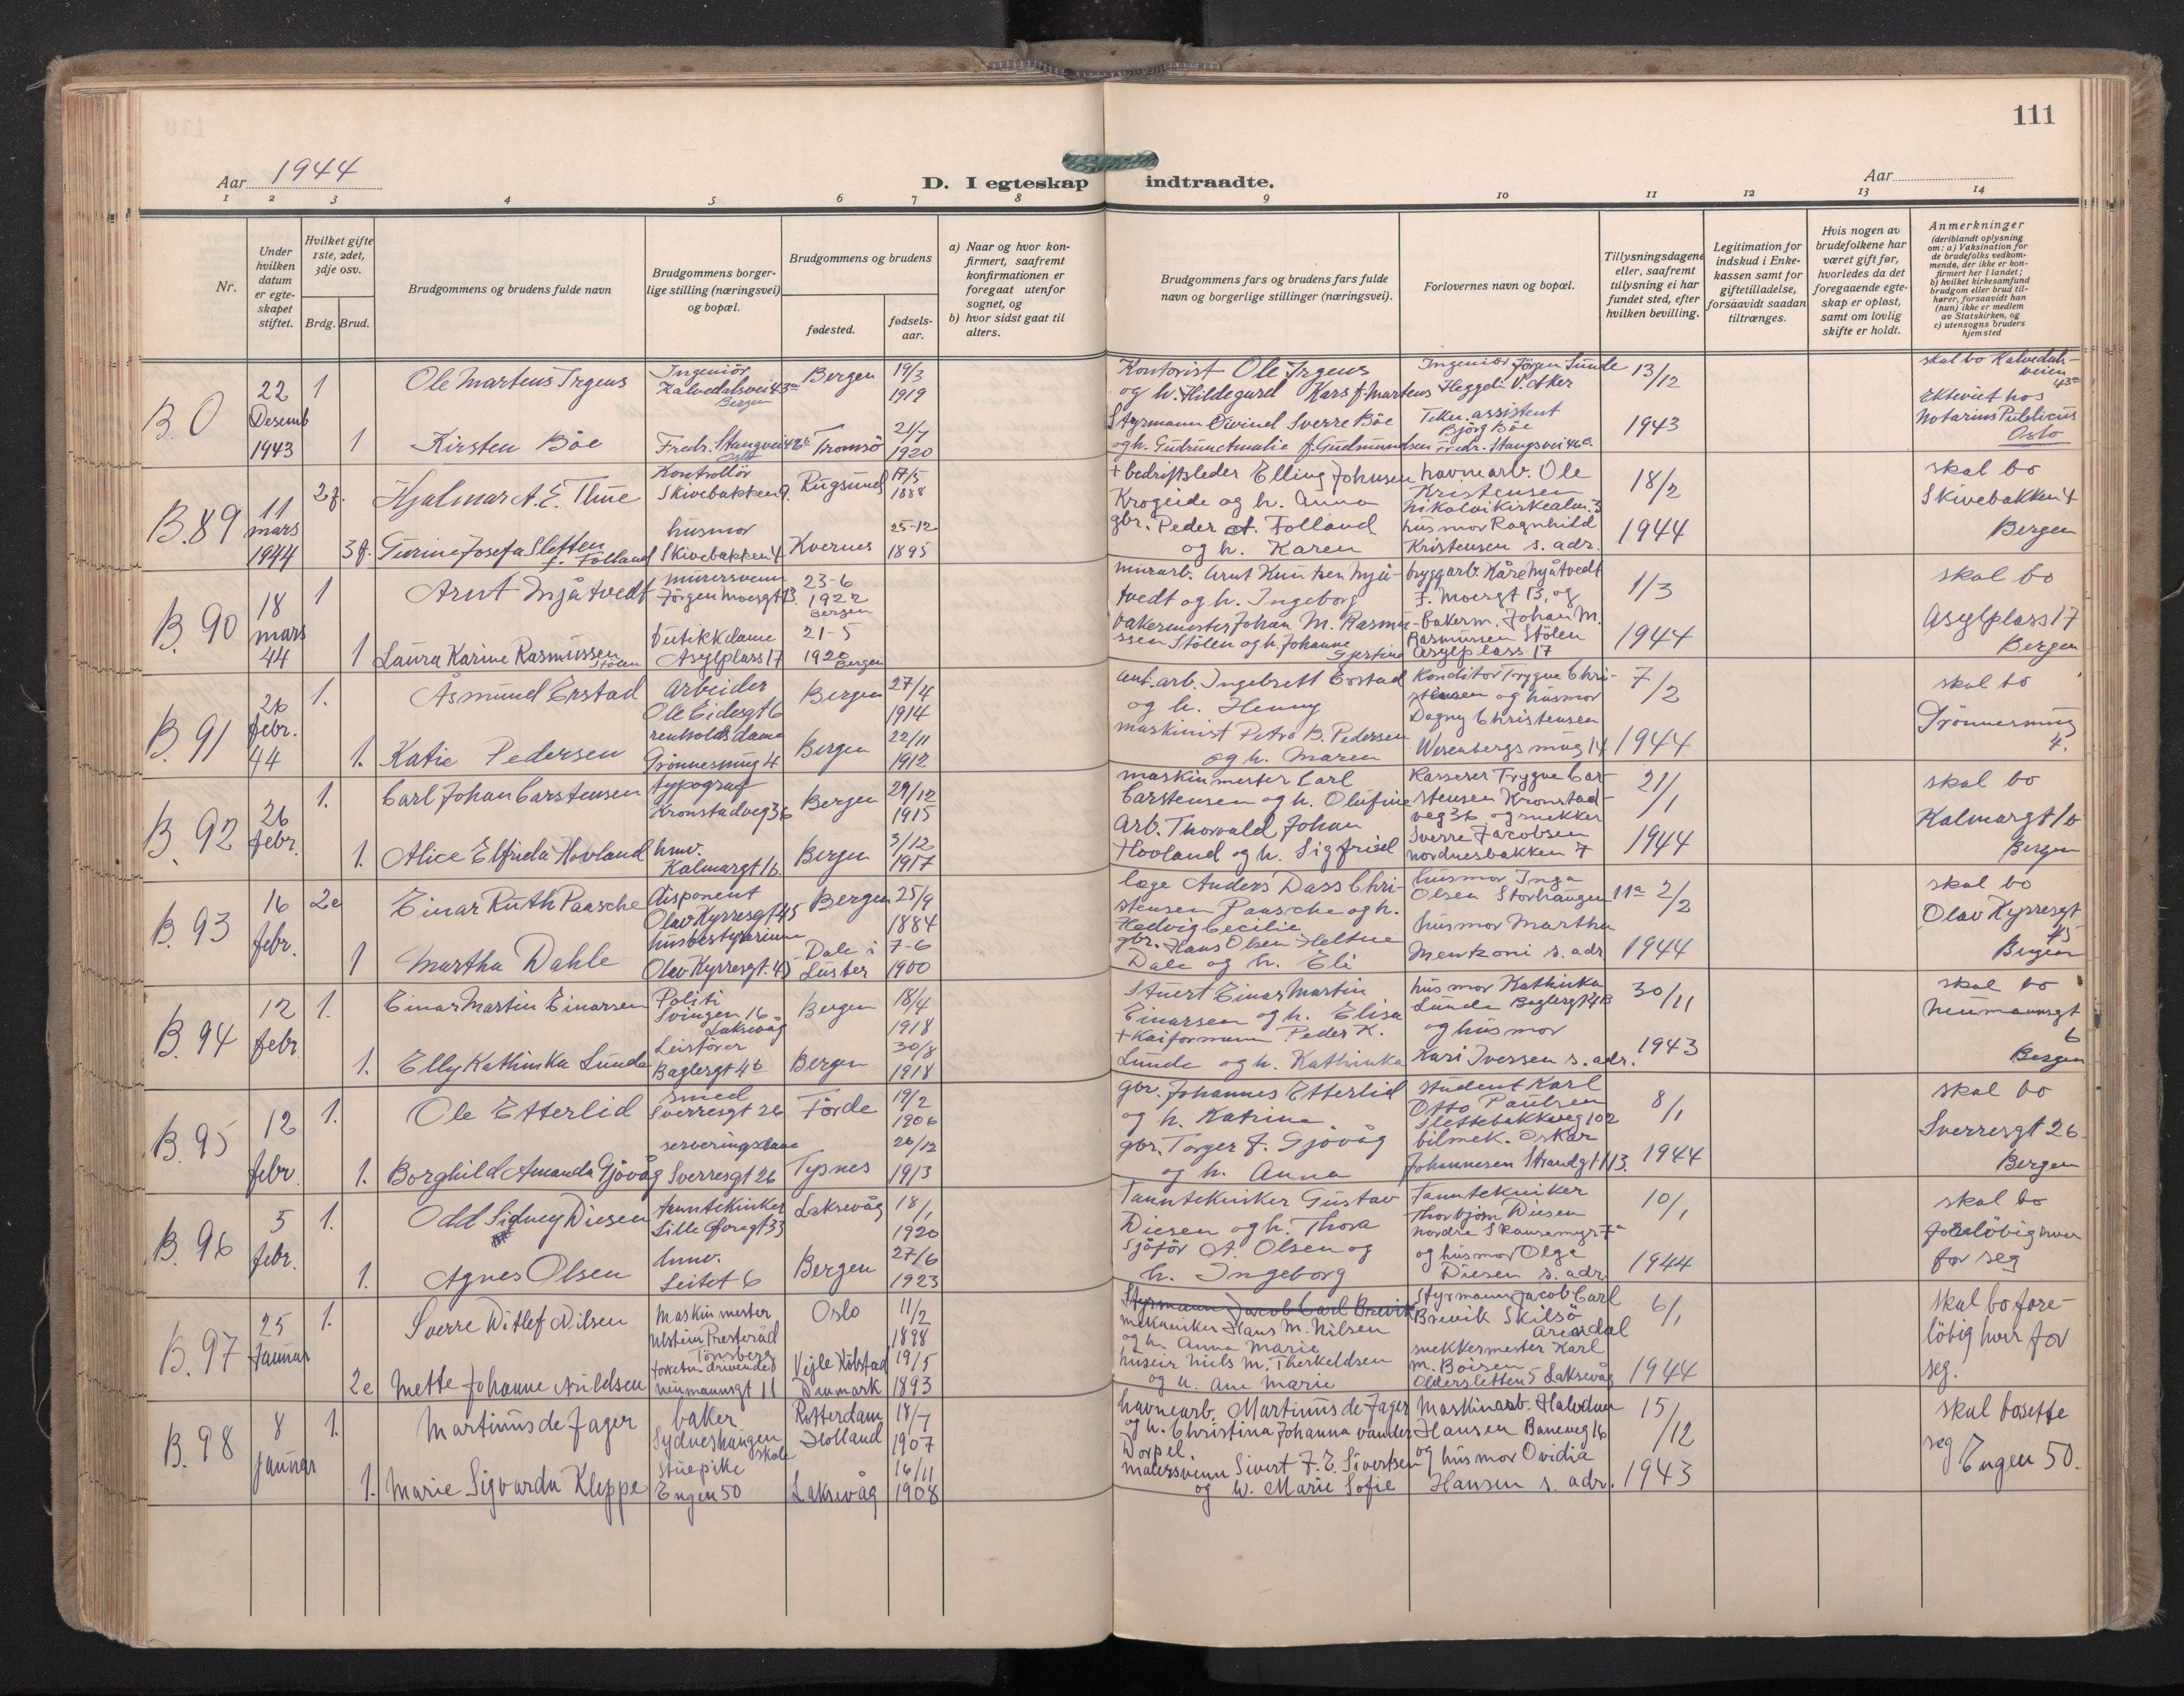 SAB, Domkirken Sokneprestembete, H/Haa: Ministerialbok nr. D 7, 1937-1950, s. 110b-111a